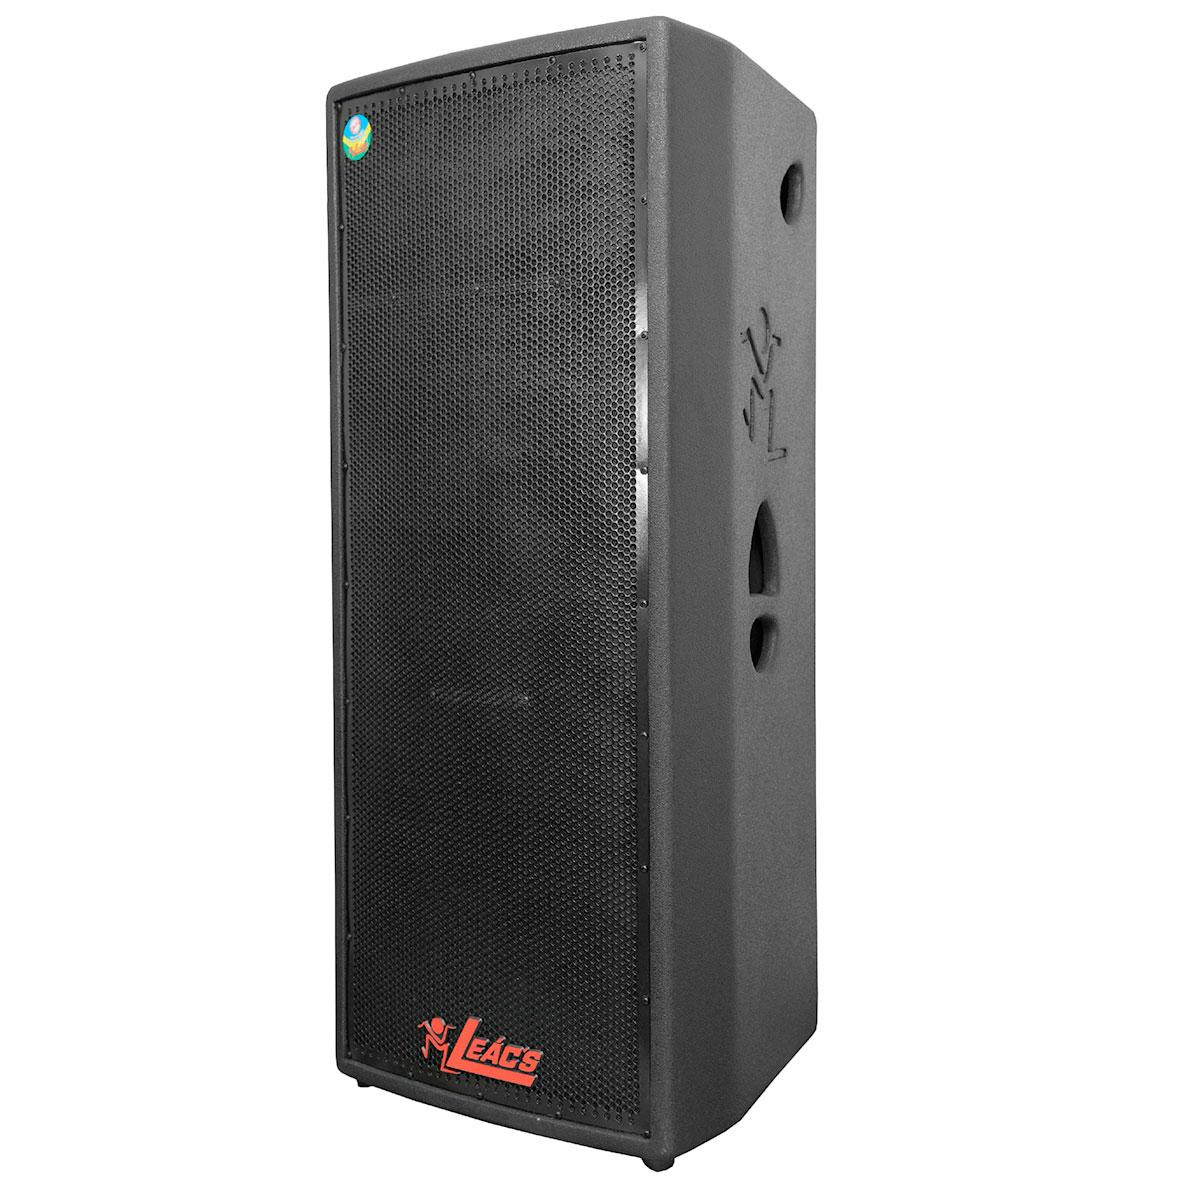 VIP1000 - Caixa Ativa 1000W VIP 1000 Plus - Leacs